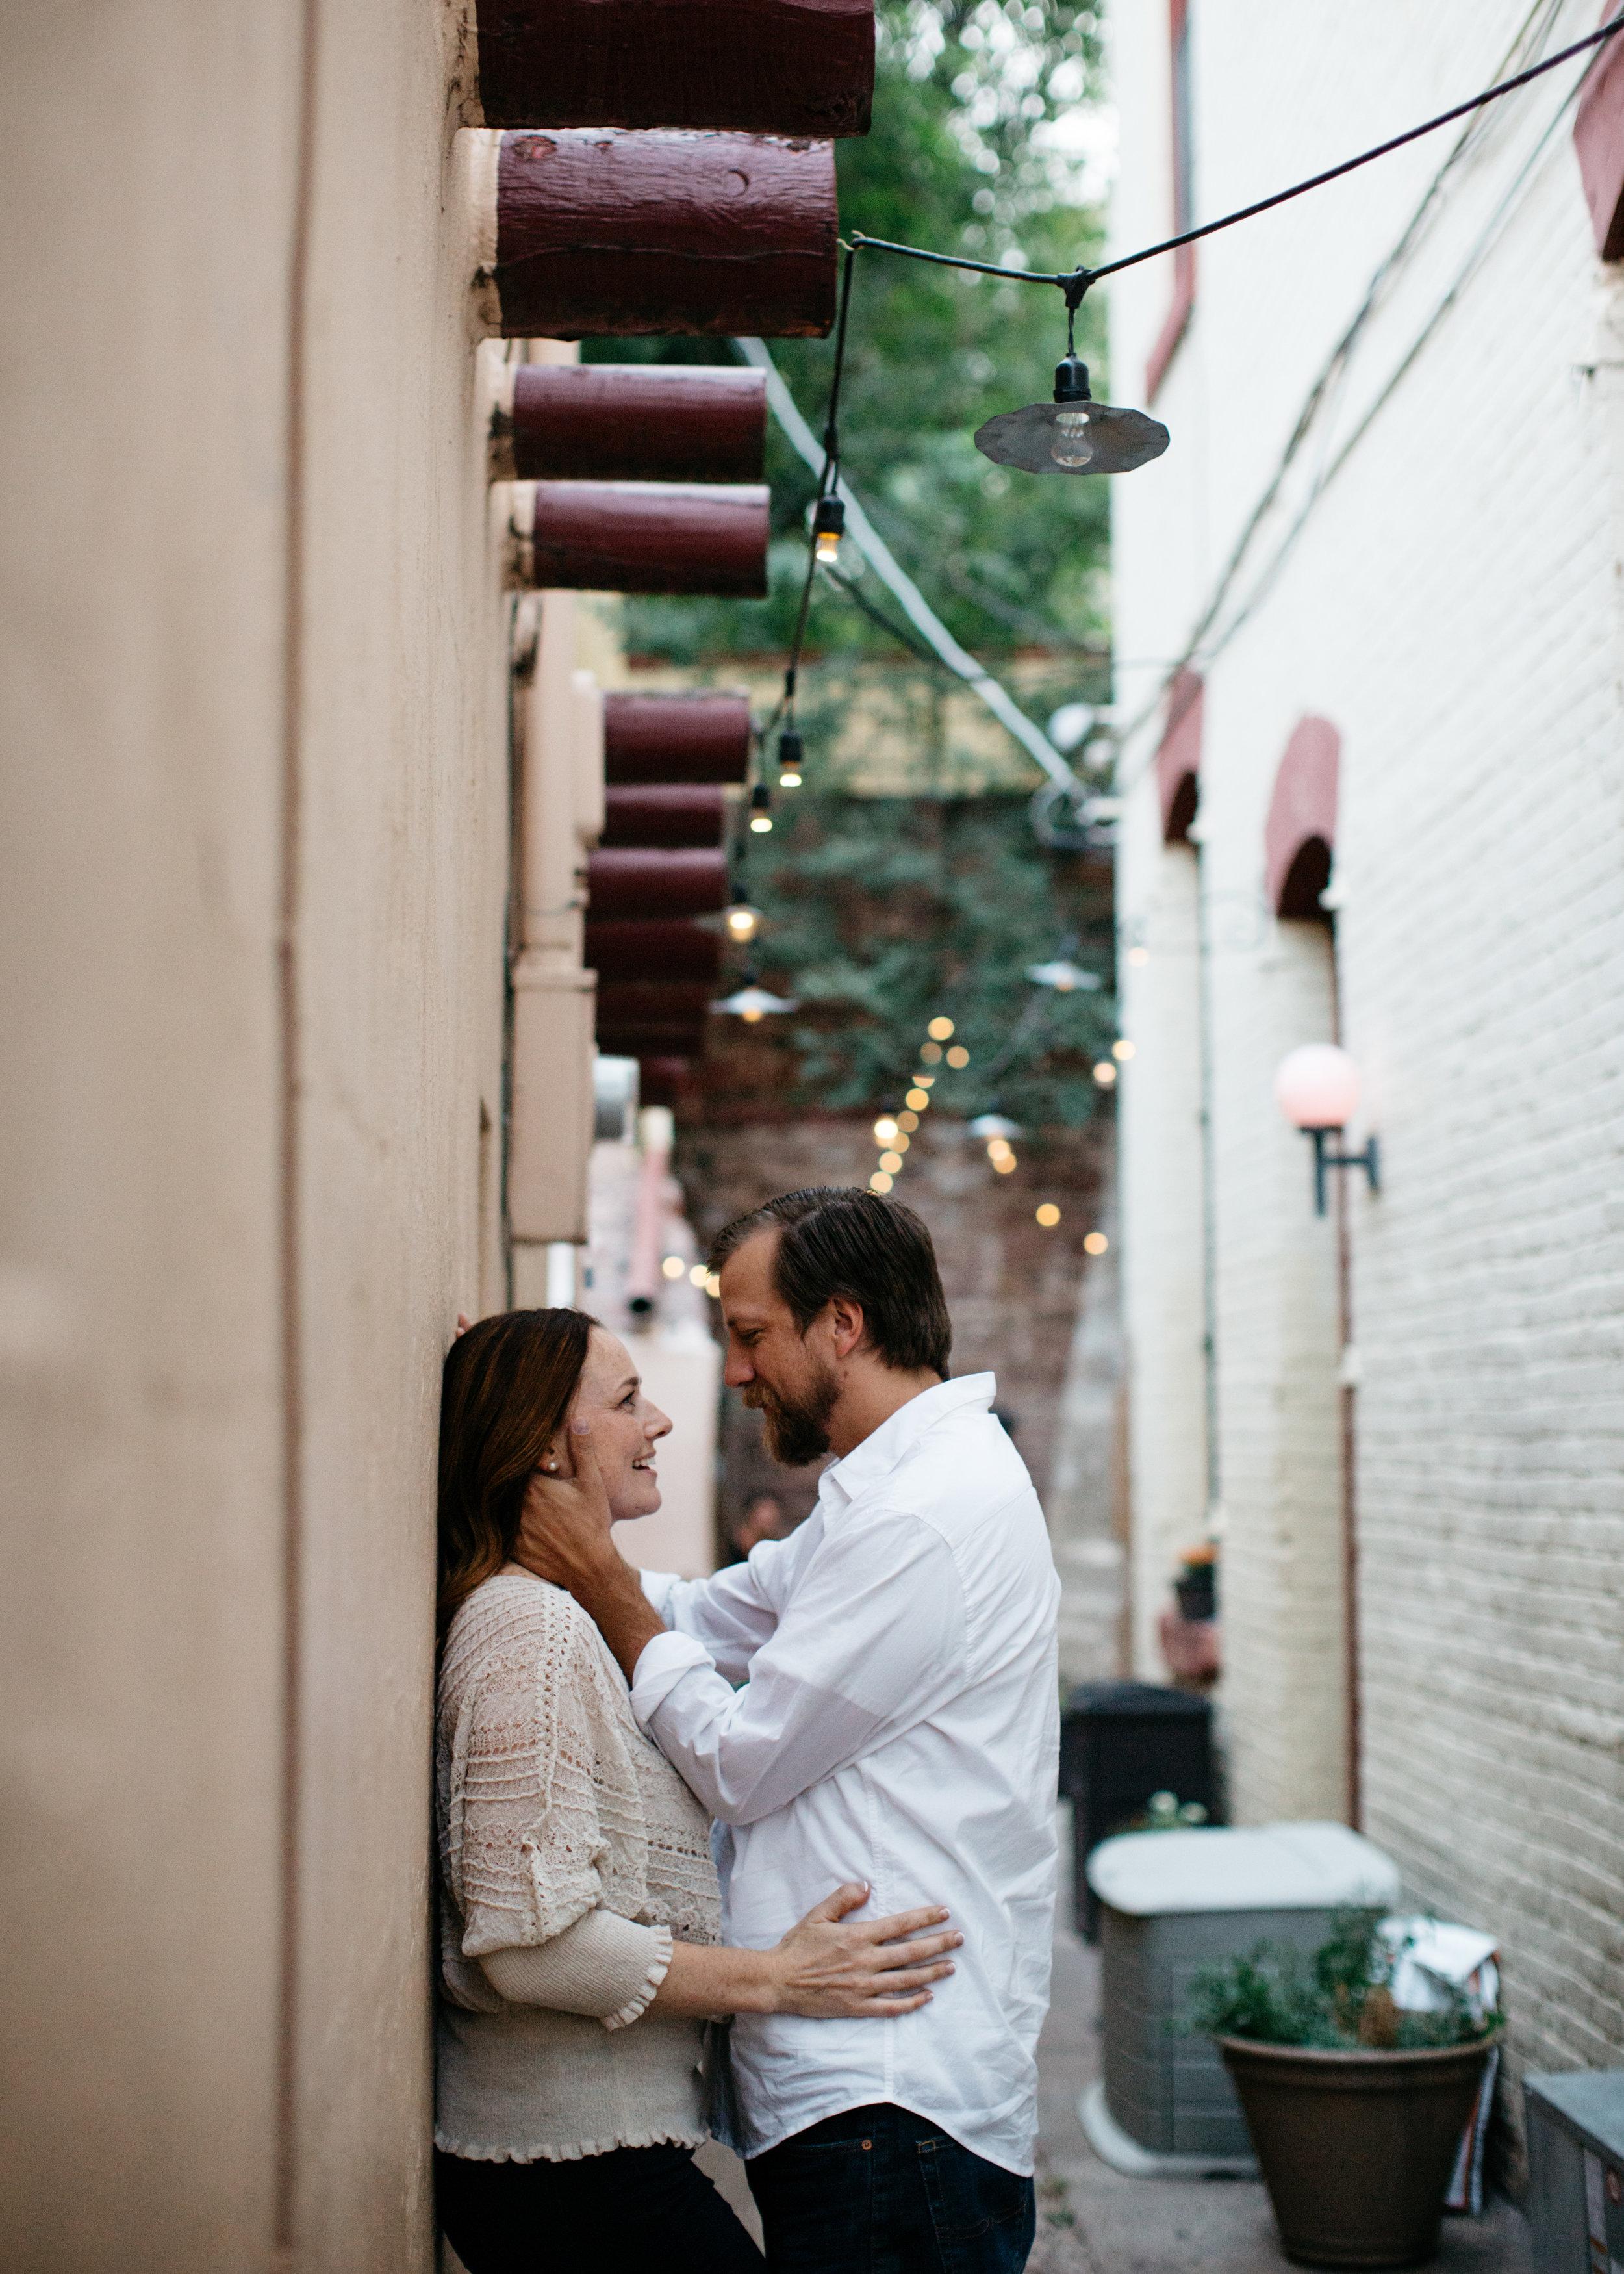 colorado-springs-engagement-photographer-114.jpg